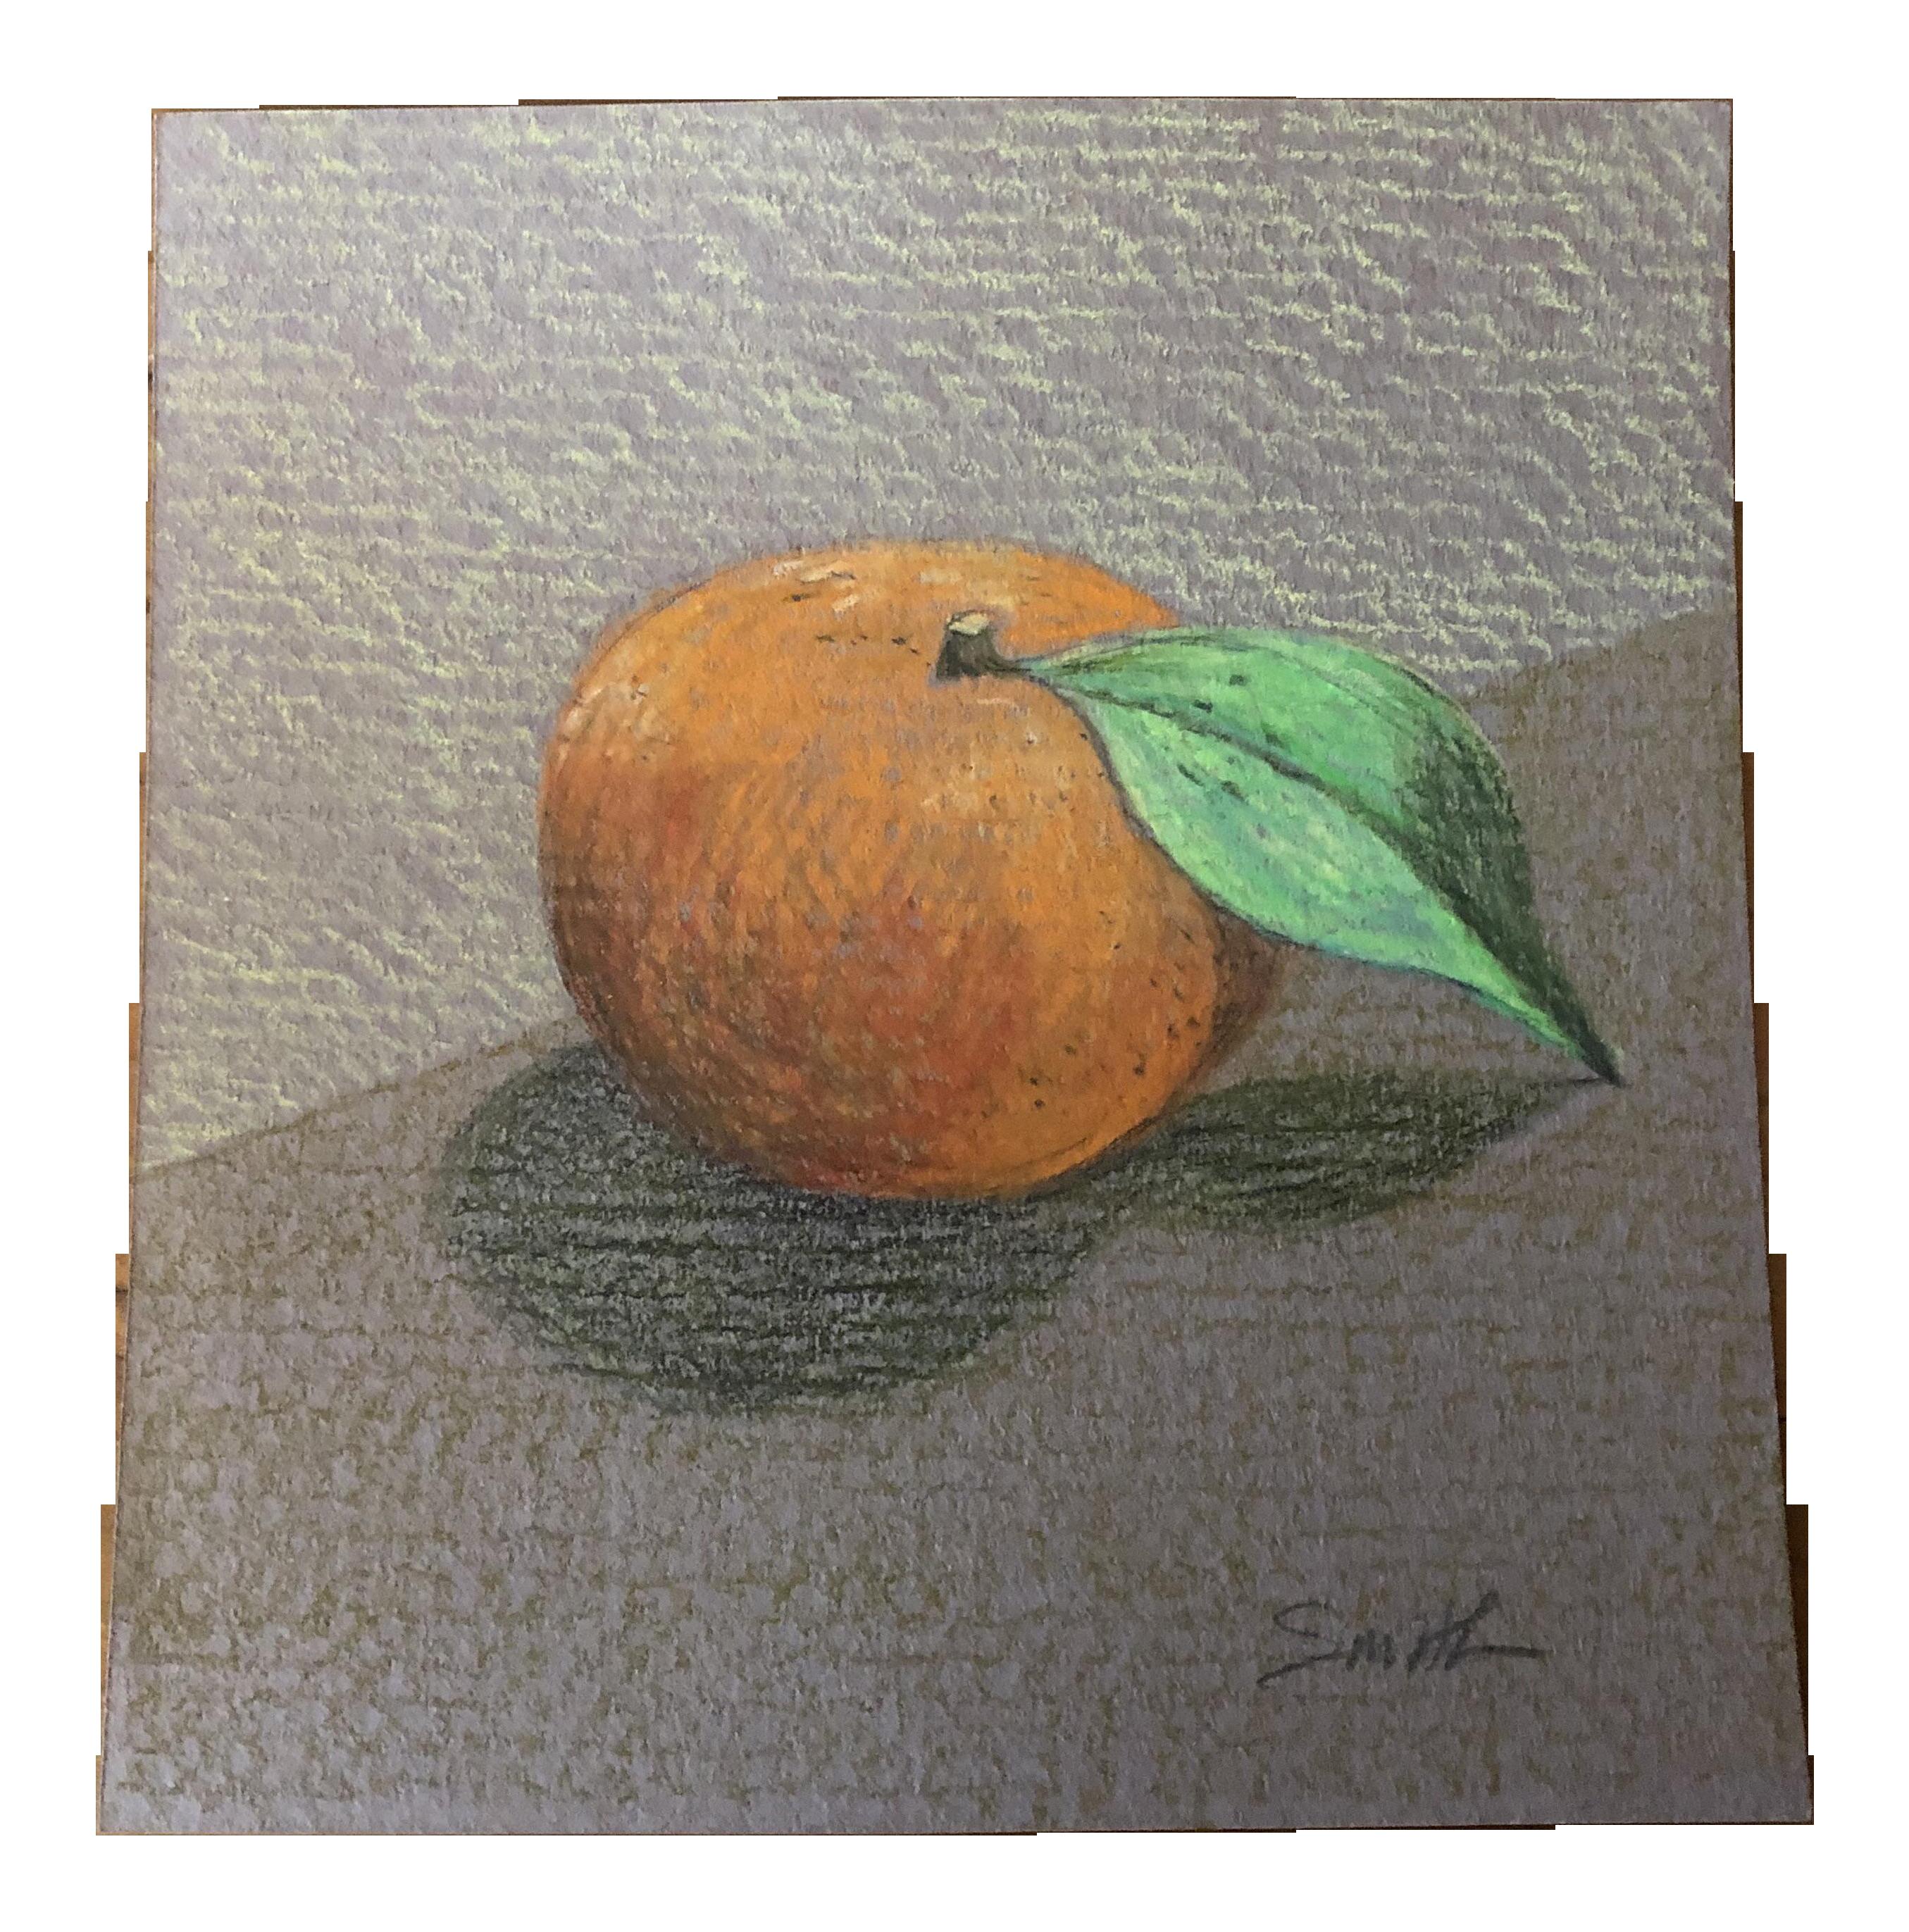 Nancy smith tangerine original colored pencil drawing